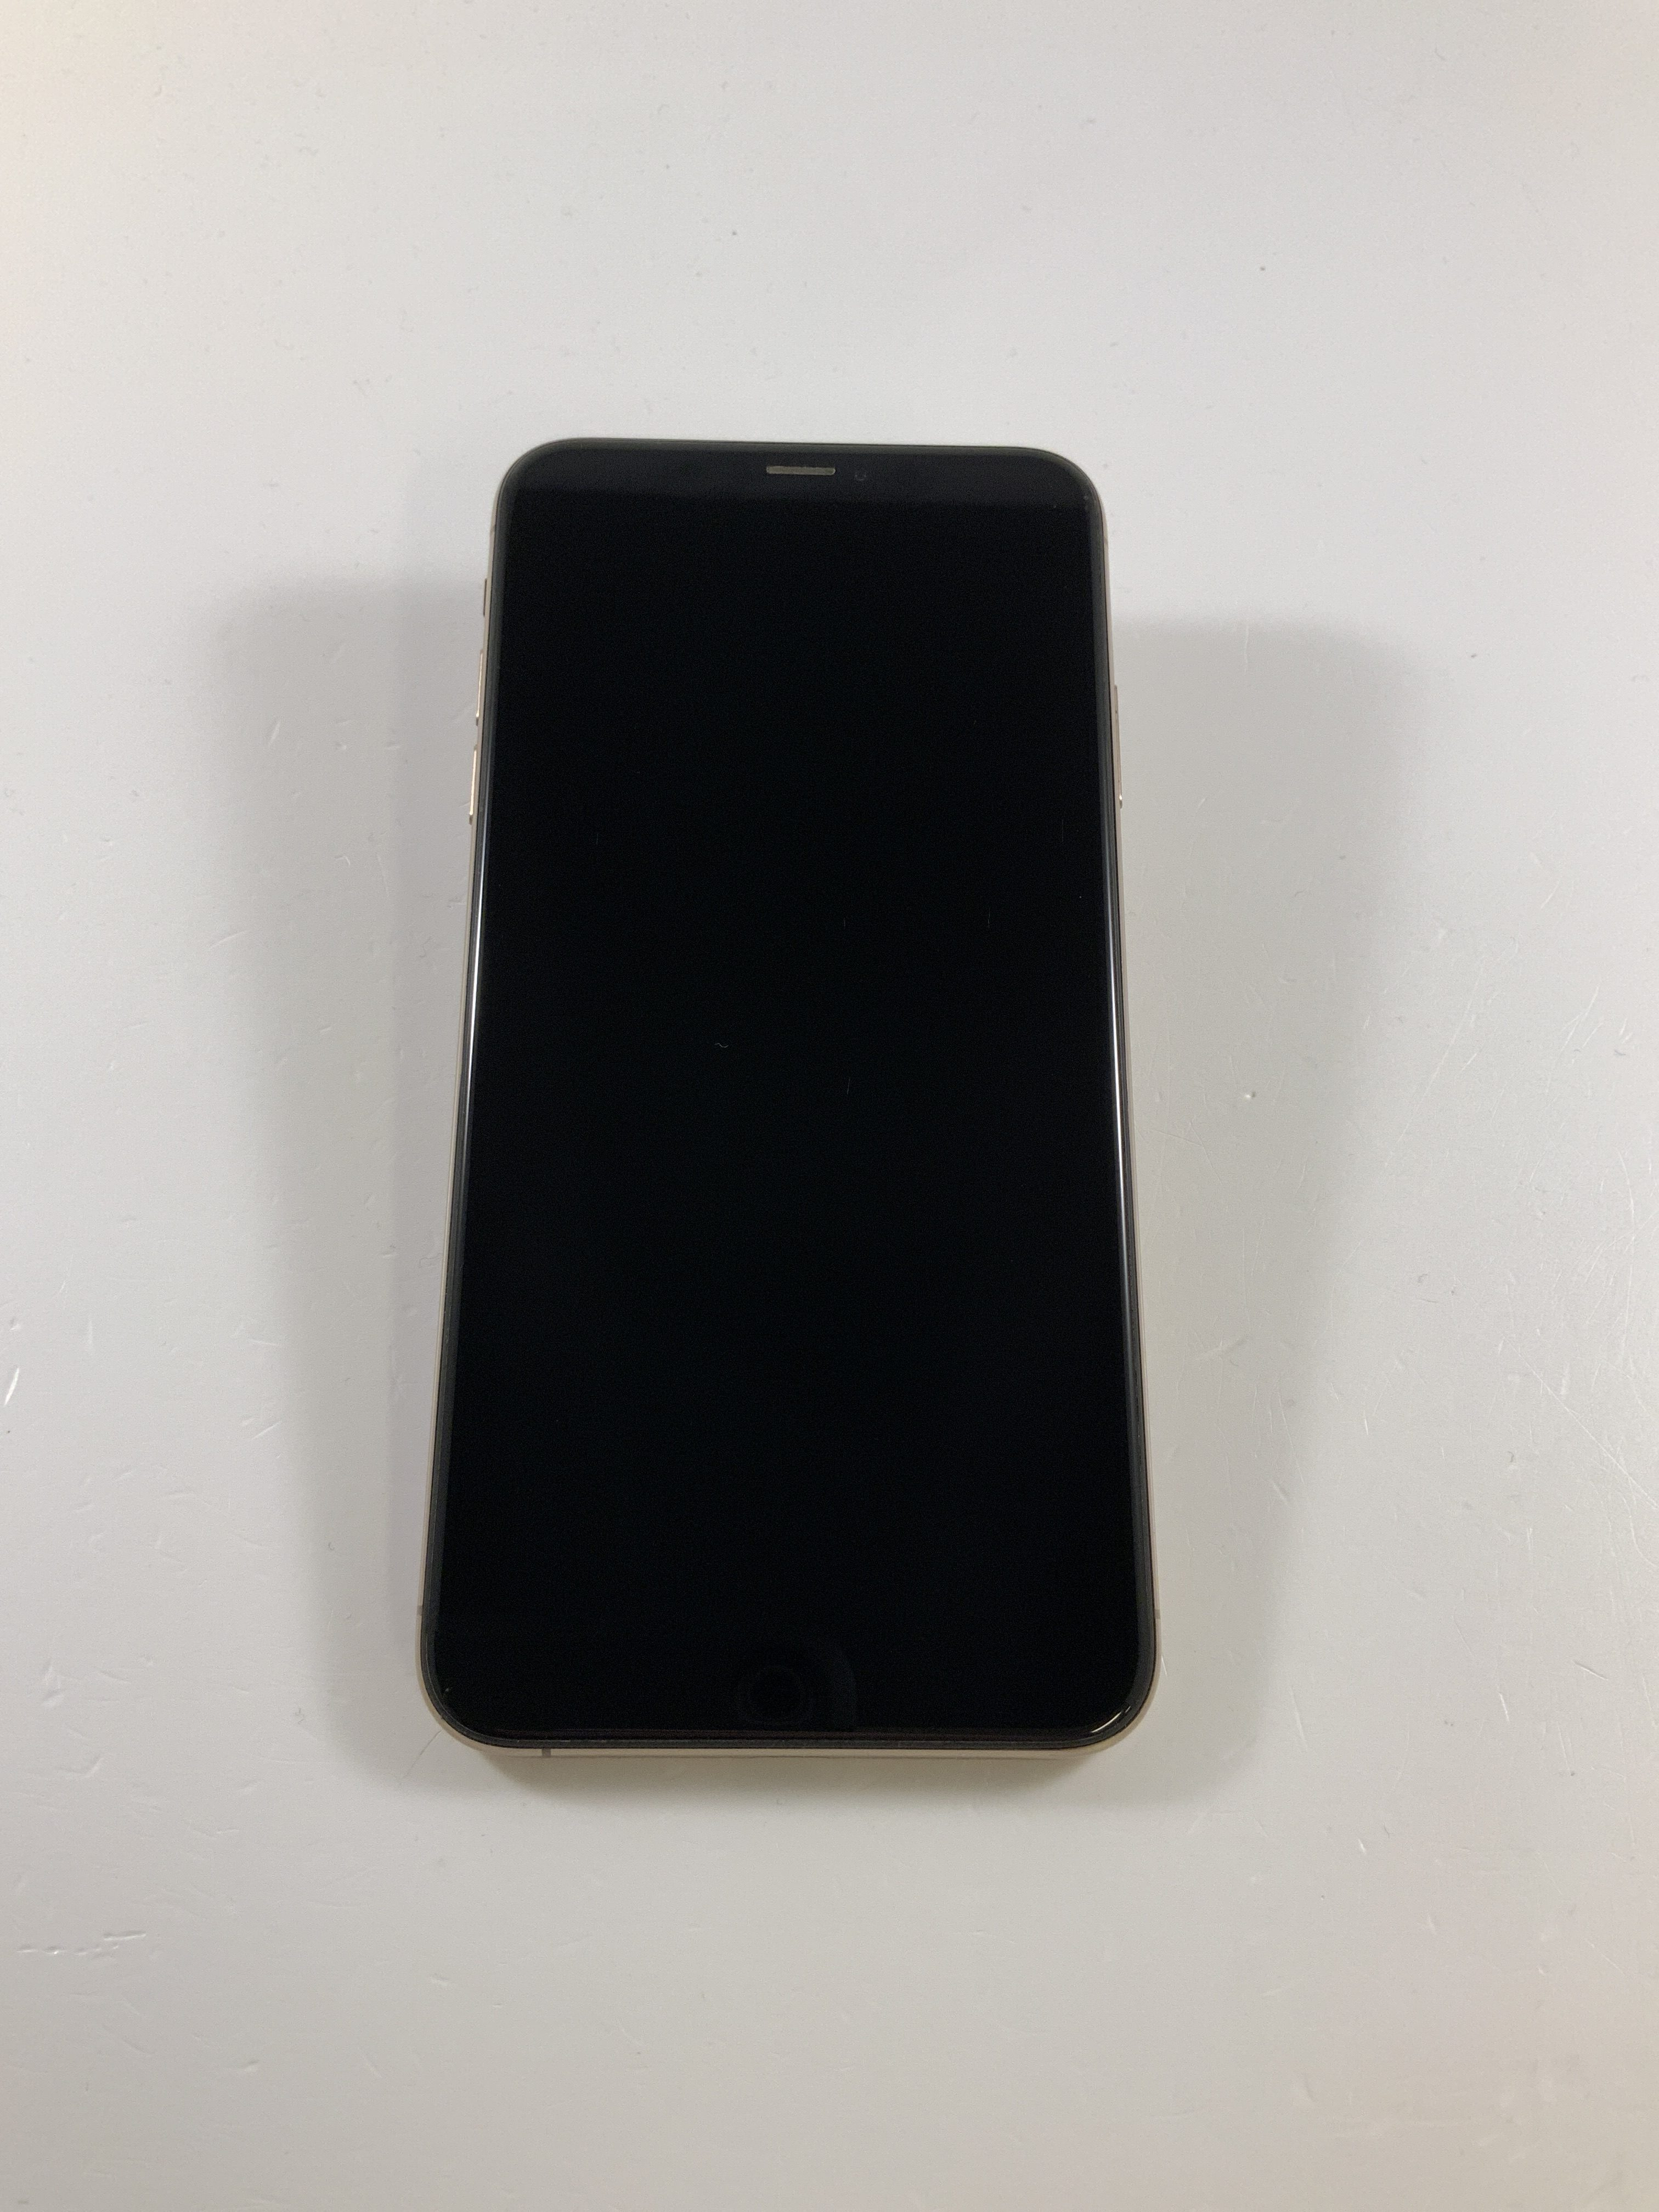 iPhone XS Max 64GB, 64GB, Gold, image 1